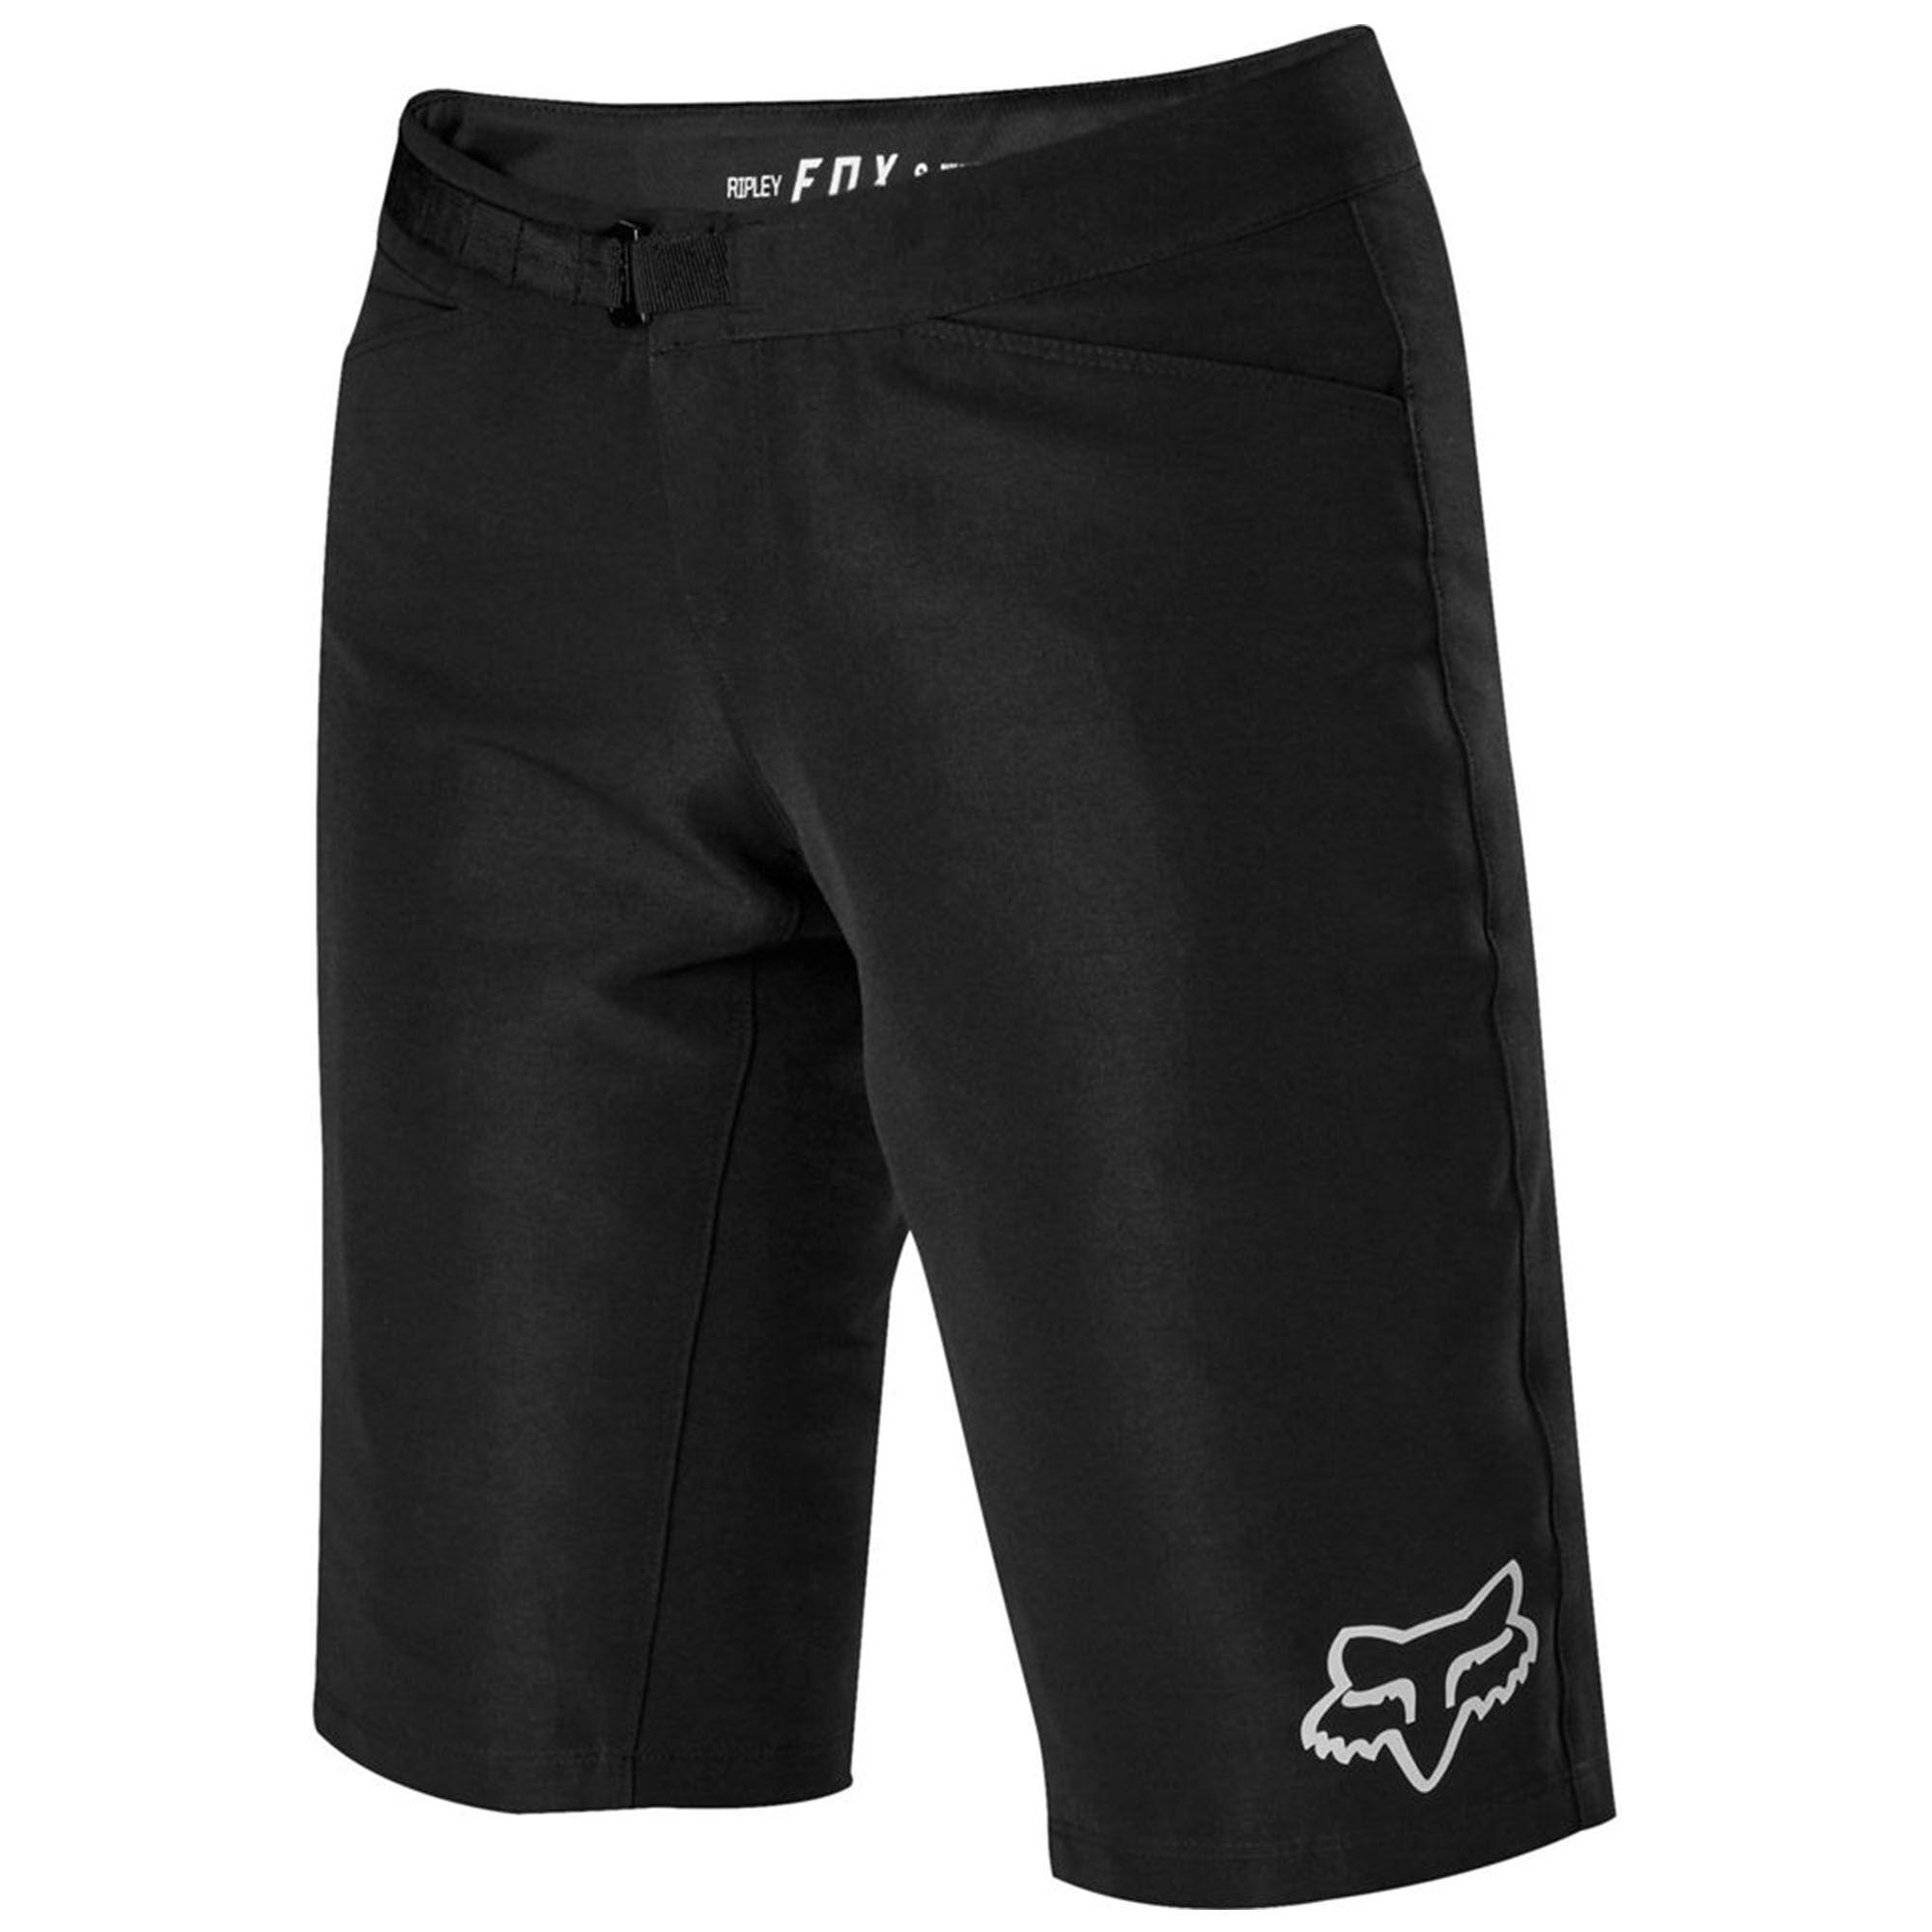 Fox Women's Ranger Cycling Shorts  - Black - Size: Extra Large